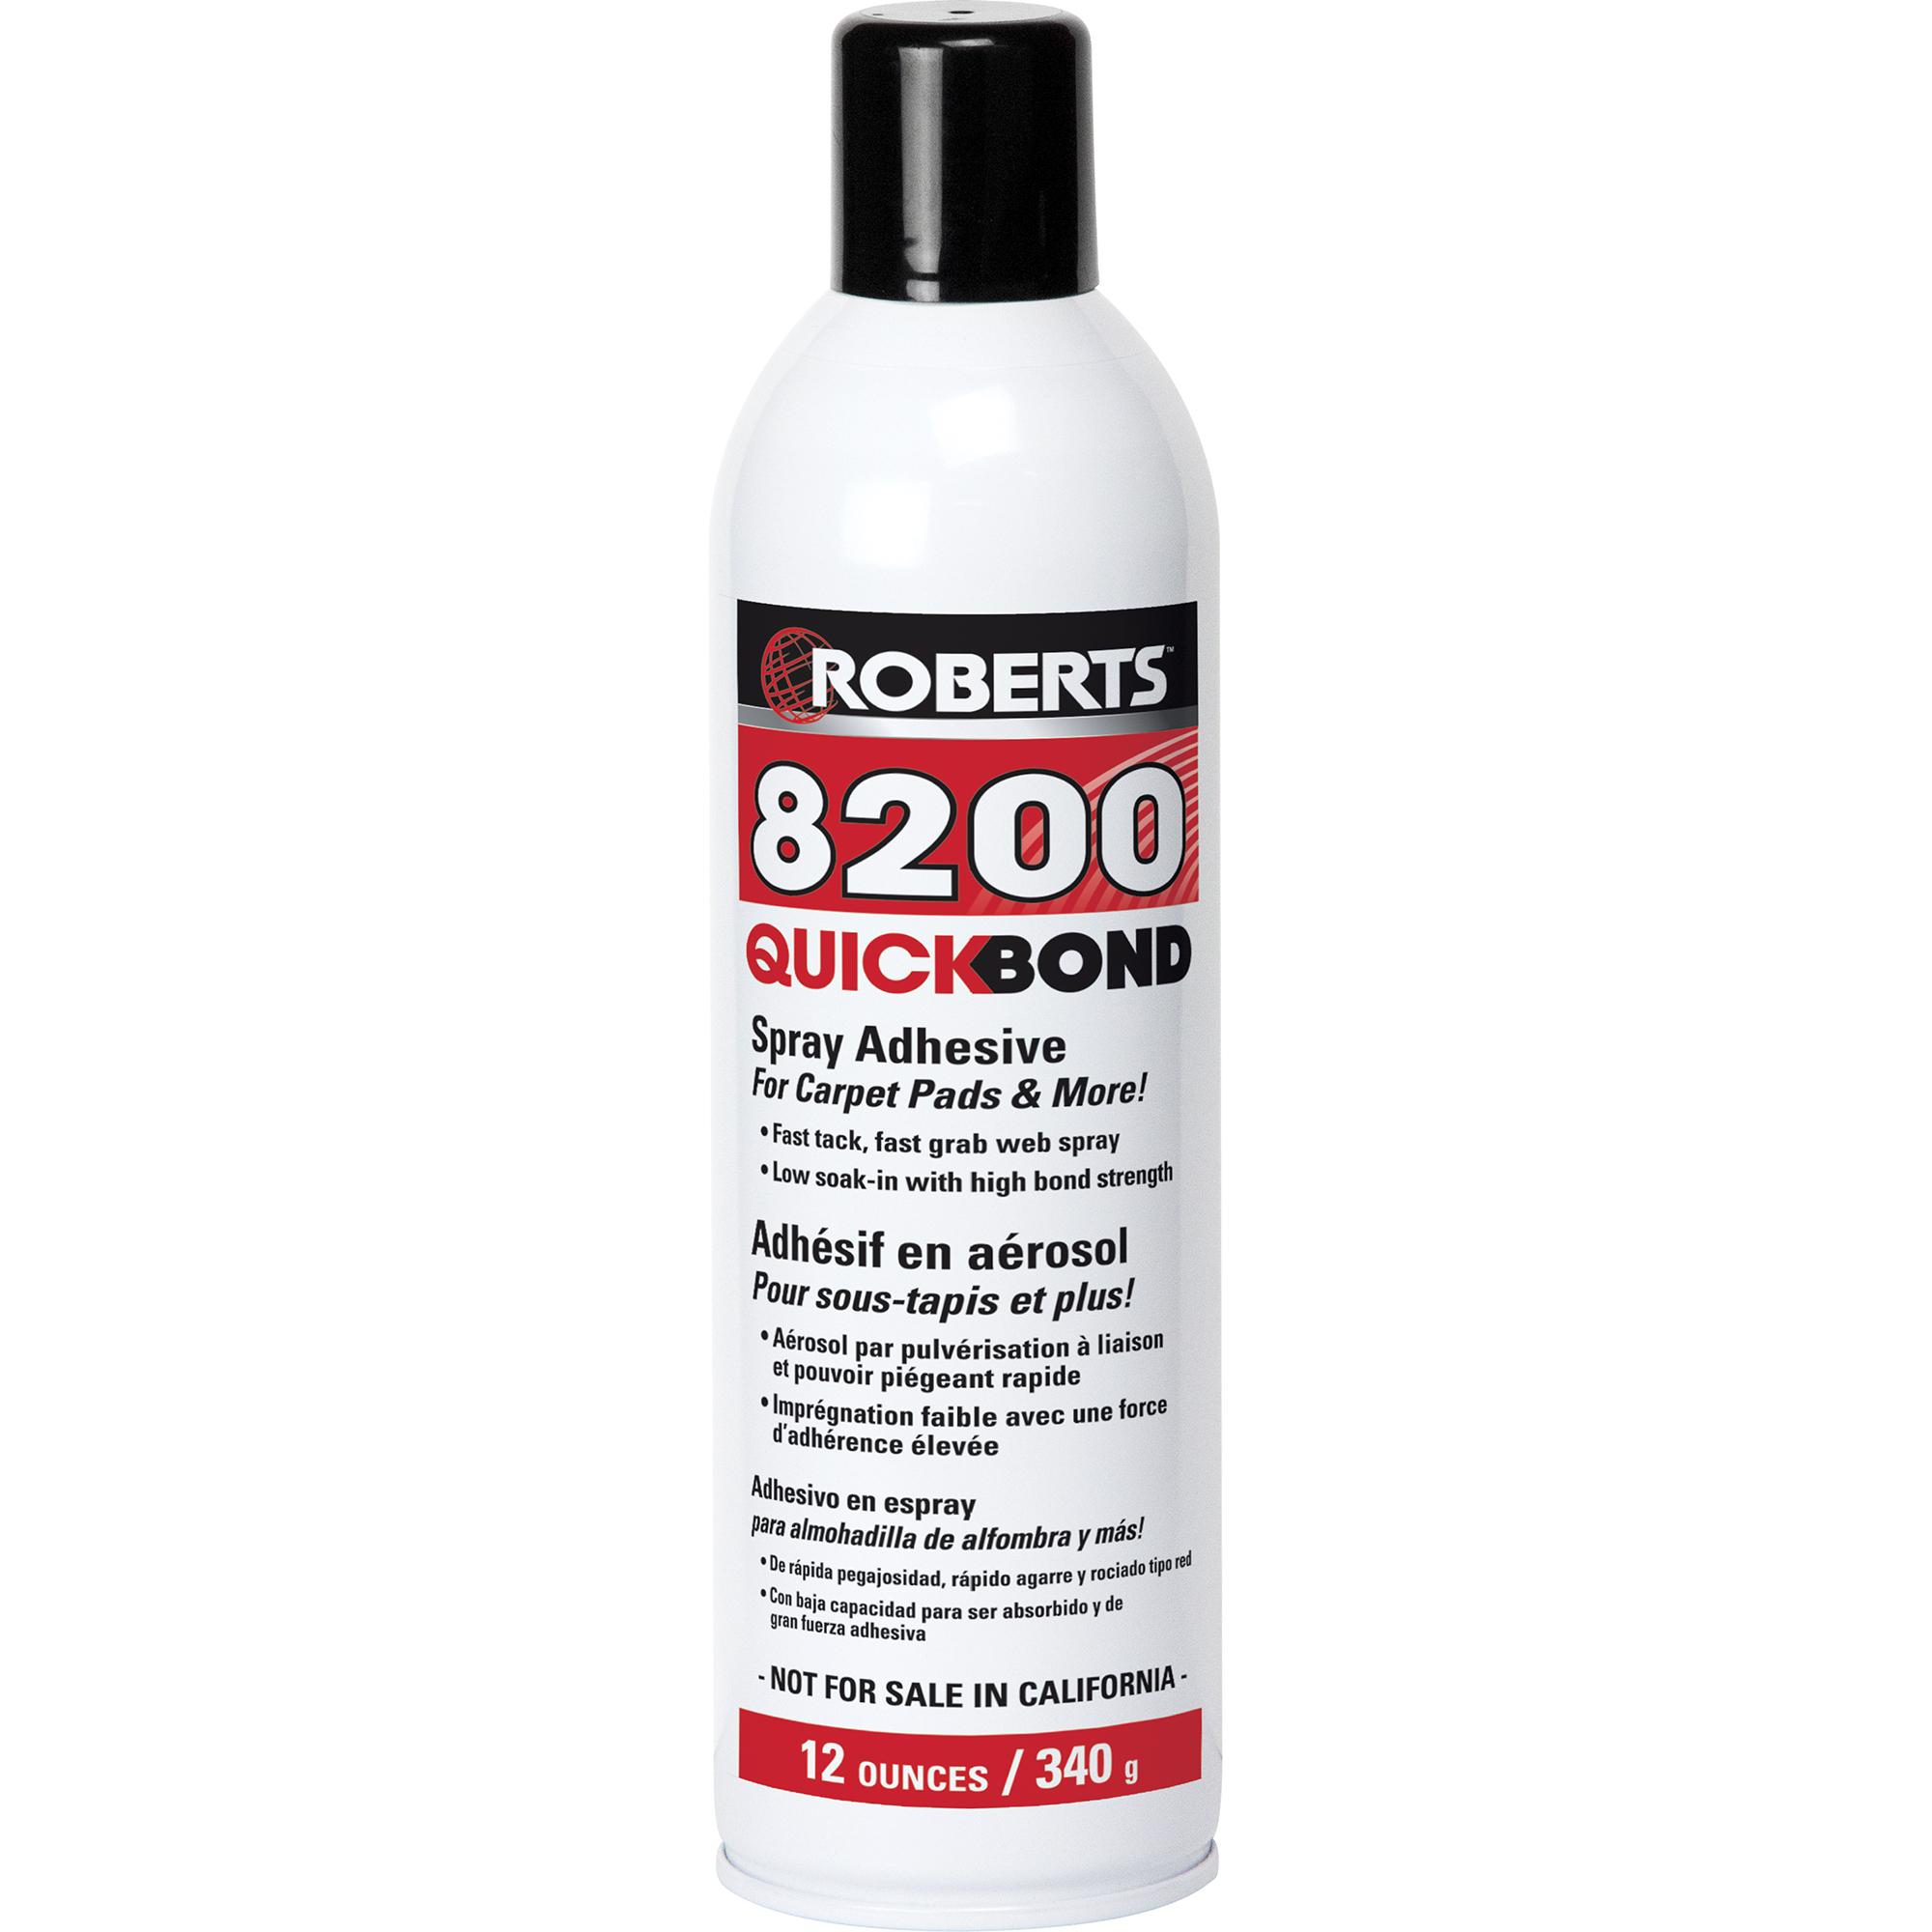 QUICK-BOND Spray Adhesive